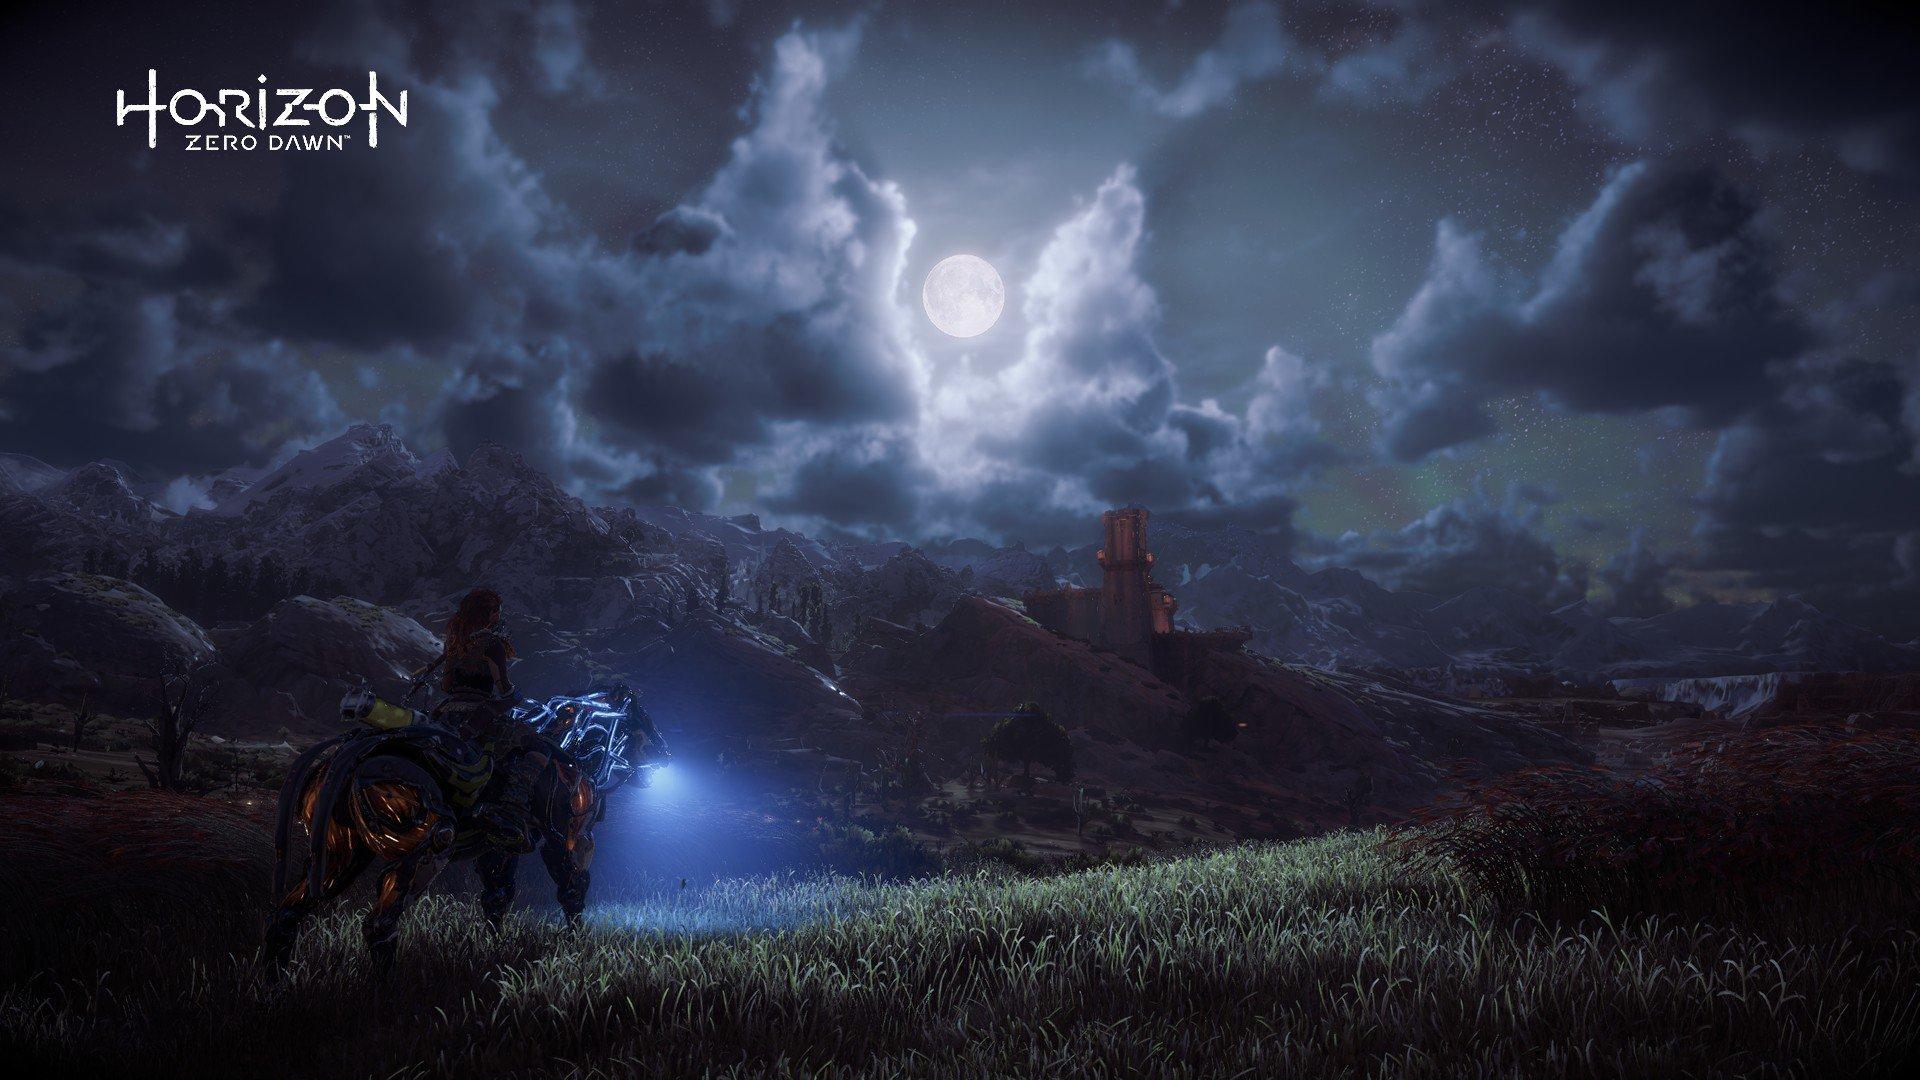 Nové možnosti ve fotografickém režimu Horizon: Zero Dawn 143383